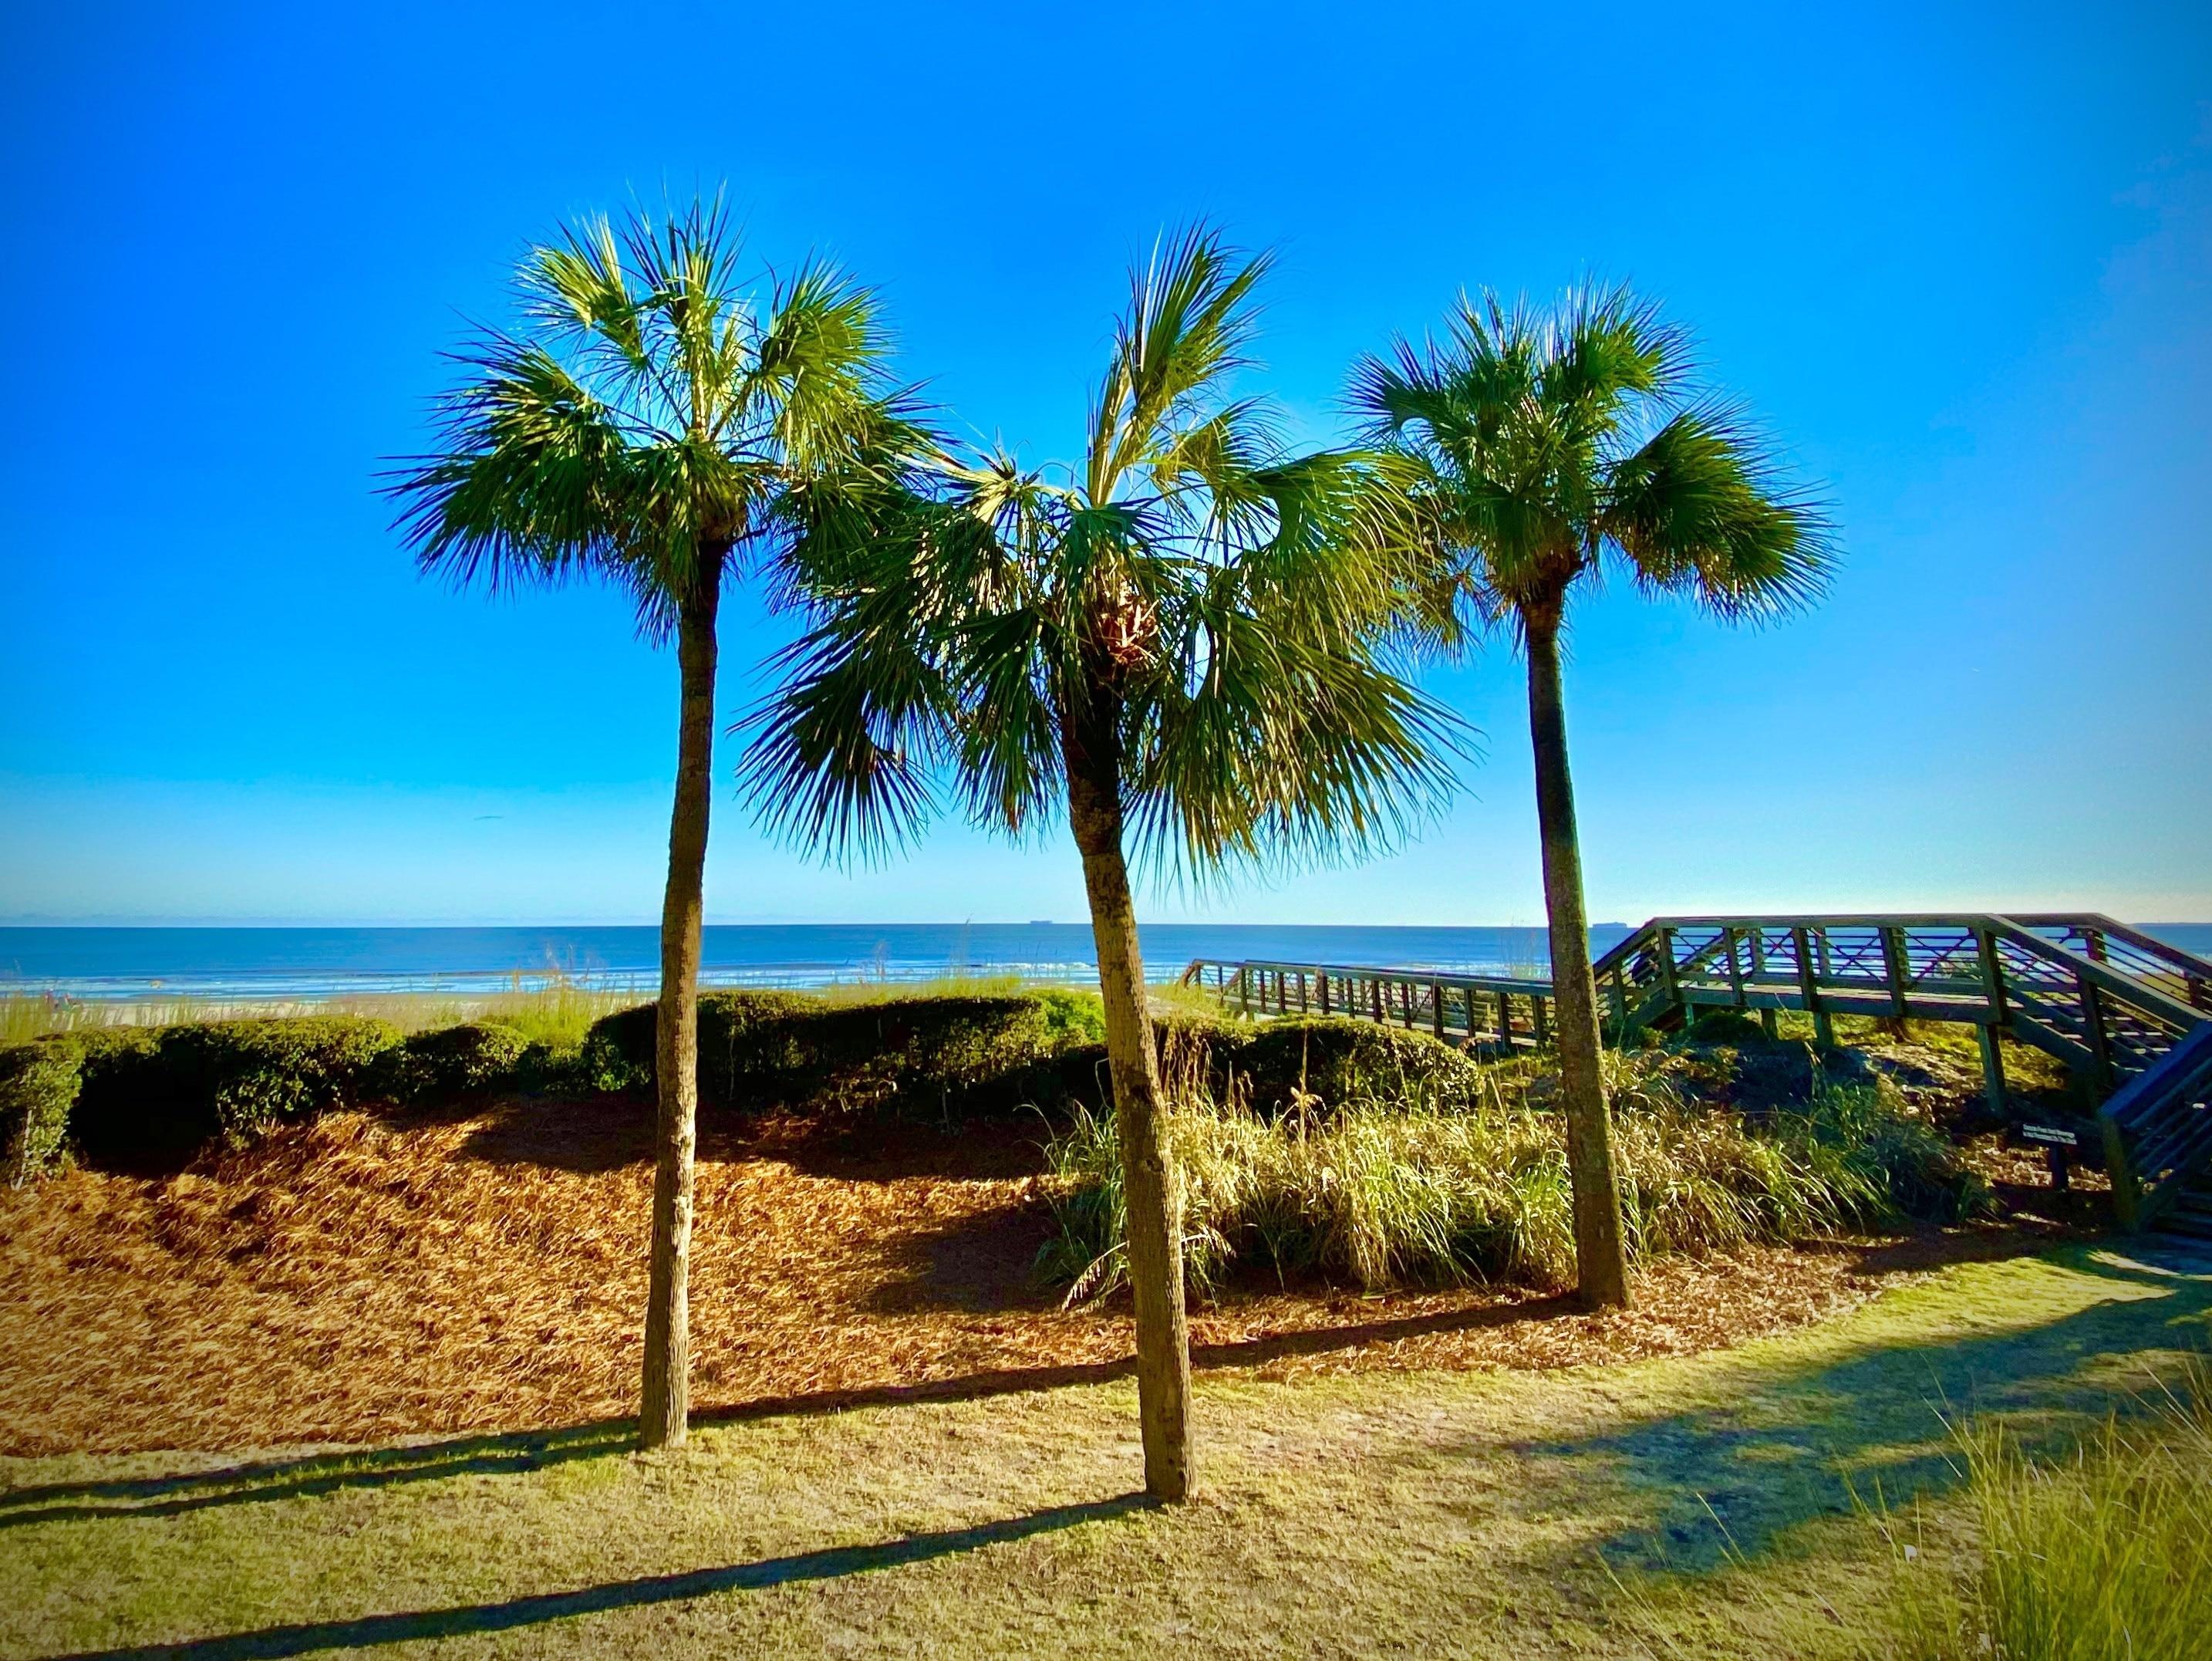 Oceanside, Hilton Head Island, South Carolina, Verenigde Staten